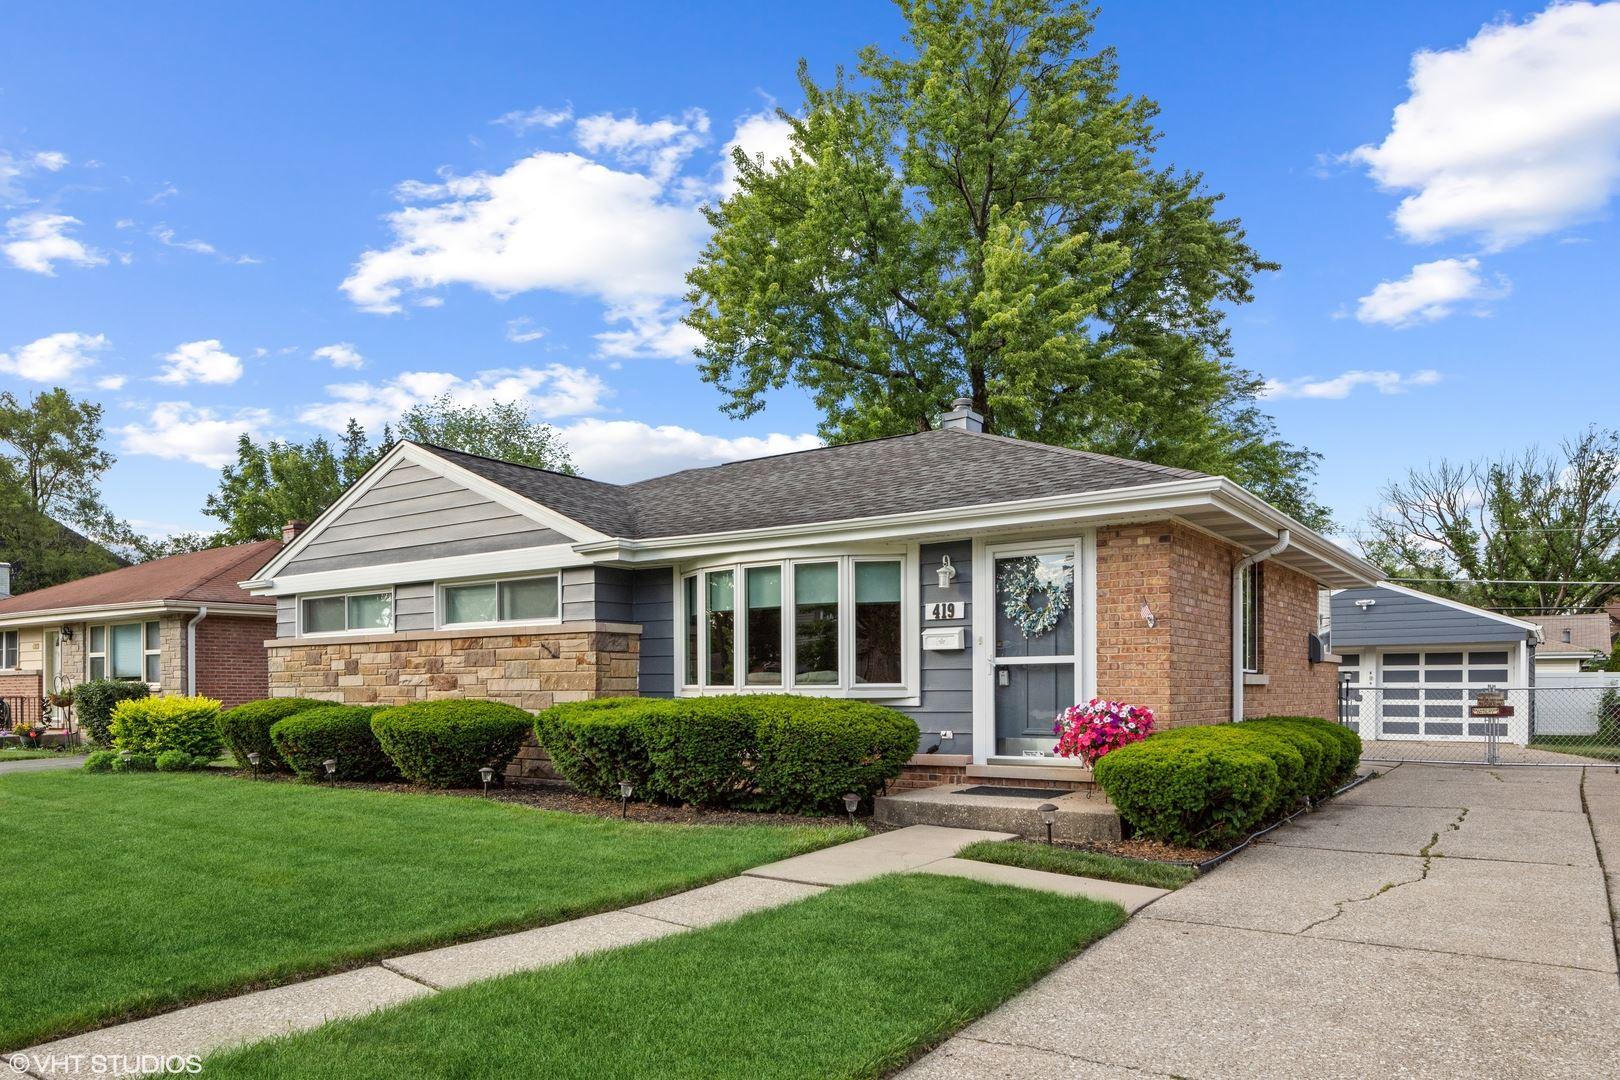 419 N Ridgeland Avenue, Elmhurst, IL 60126 - #: 11119791